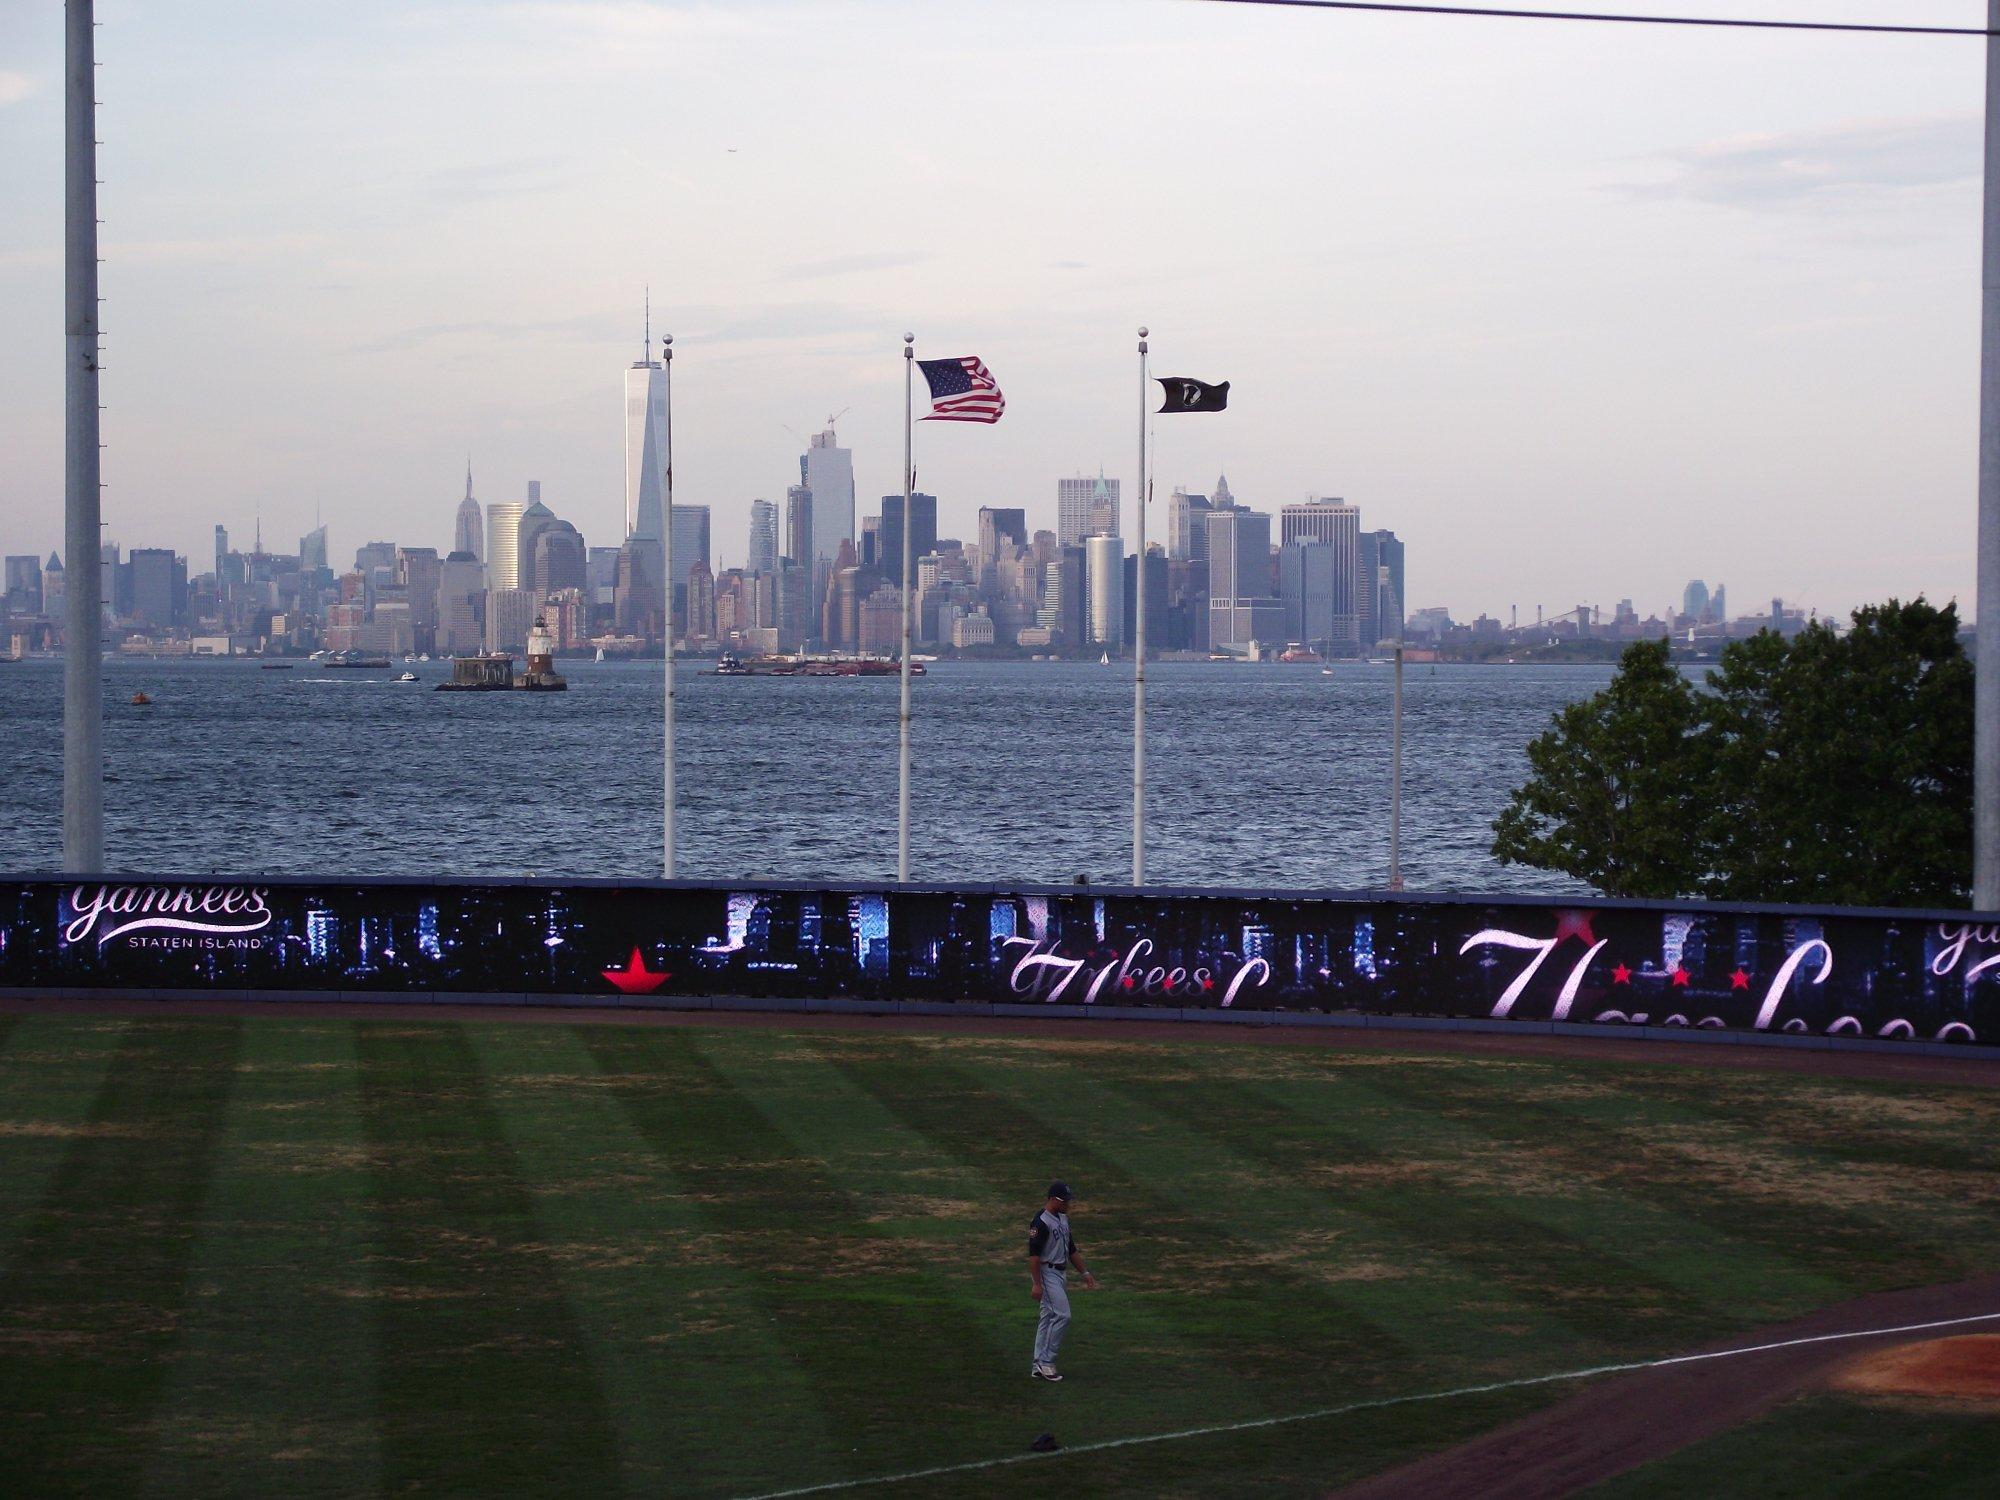 UA Staten Island Stadium 16 U0026 RPX